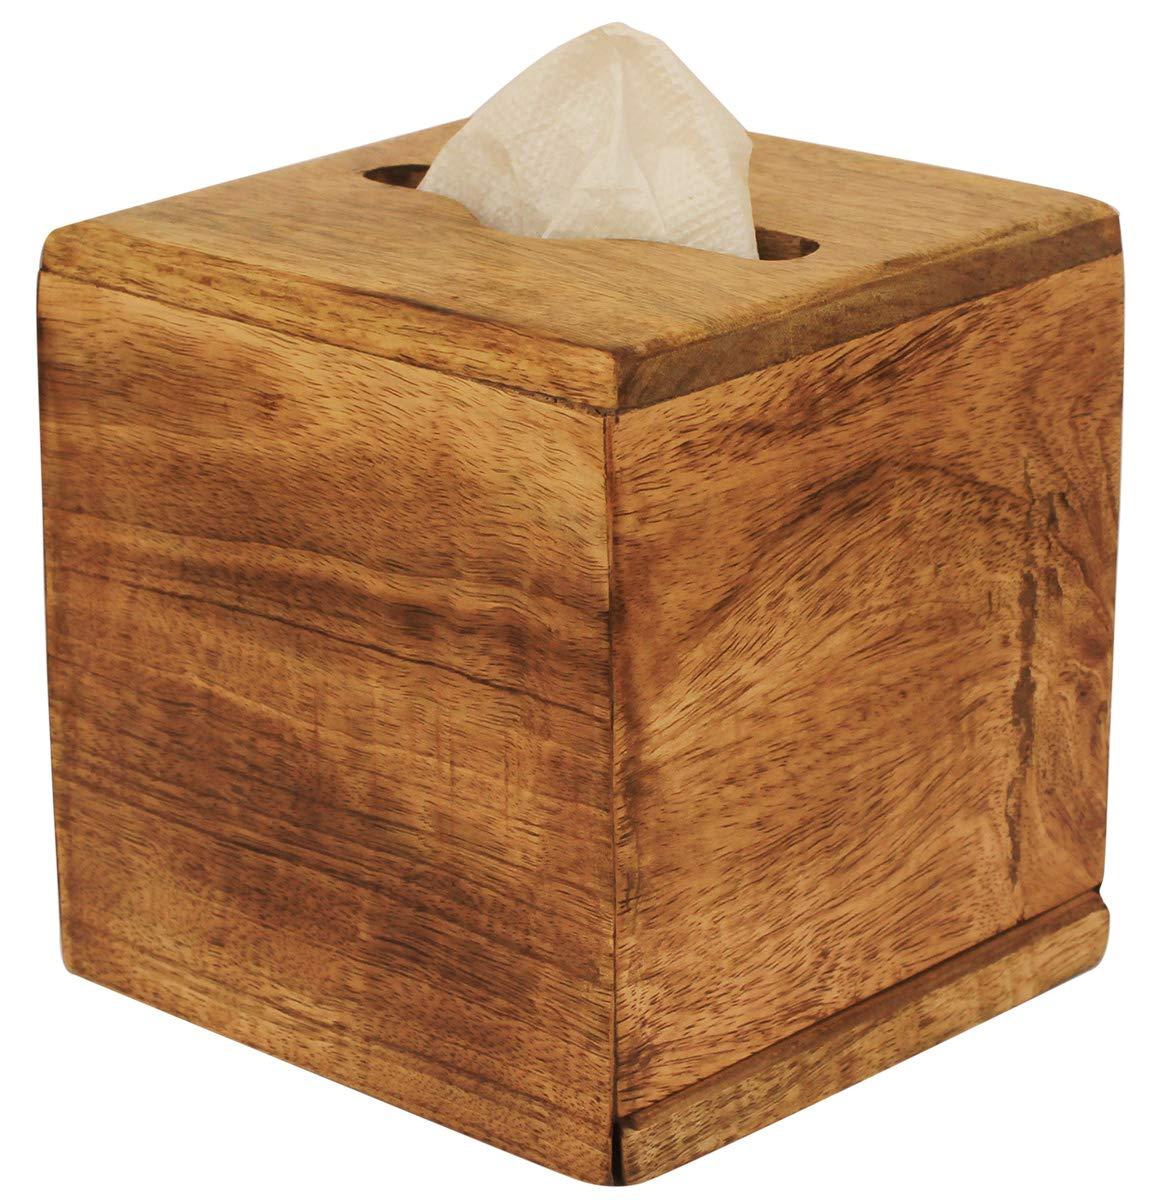 Crafkart Best Buy Wooden Plain Kleenex Tissue Box Holder - Brown Wood Paper Tissue Holder for Napkin and Tissues - Perfect Home Table Decor by CRAFKART